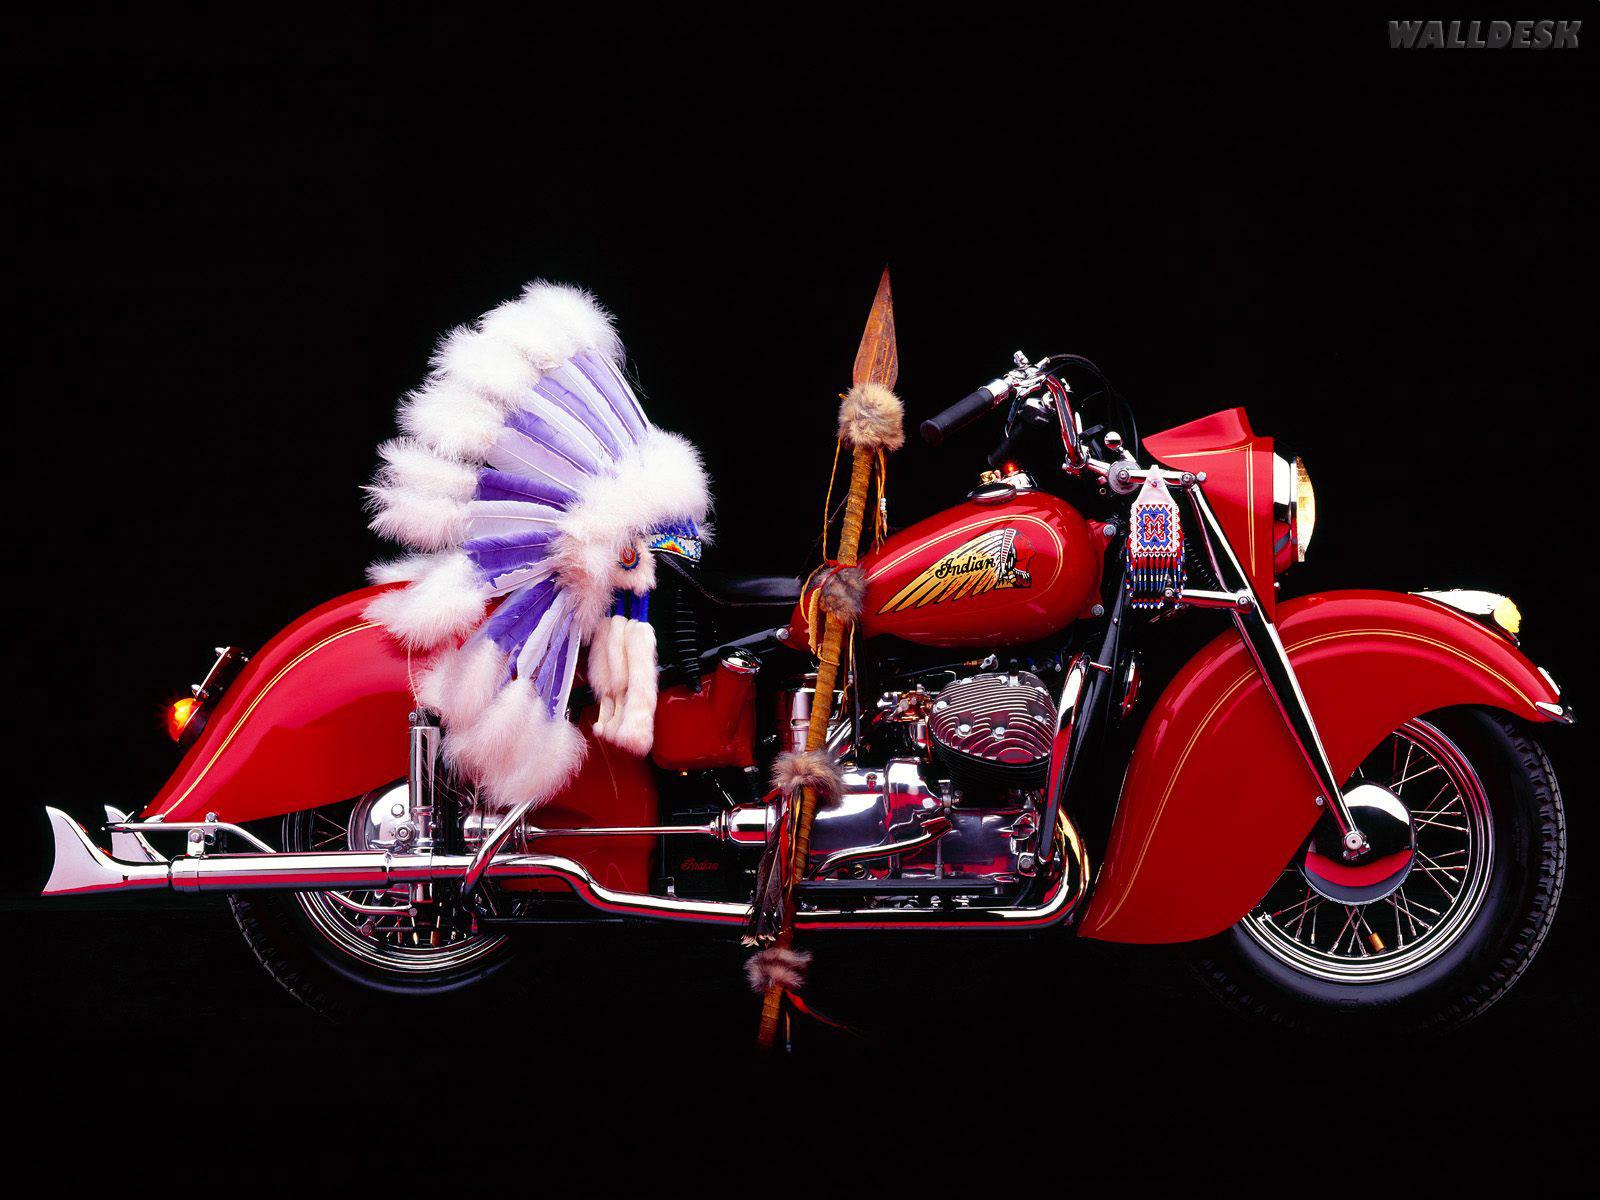 motorcycle wallpaper Indian Motorcycle Wallpaper 1600x1200